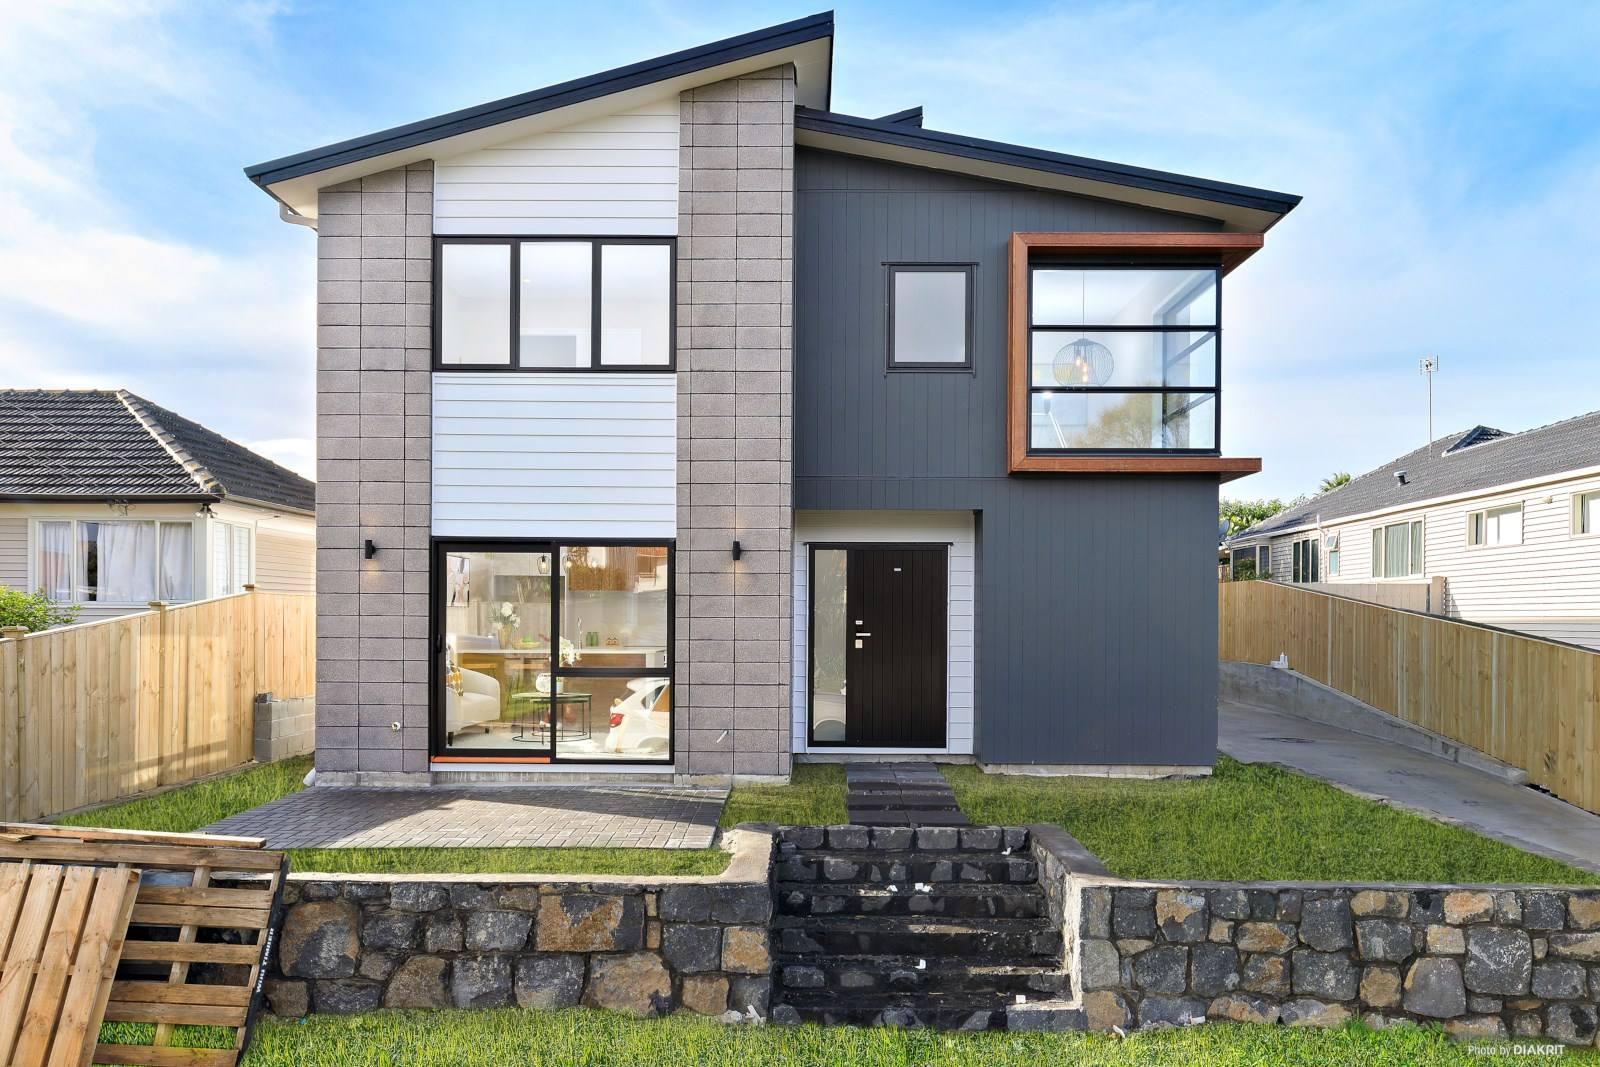 Mount Wellington 3房 全新优质城市屋 零物业费 维护成本低 紧挨Sylvia Park 交通便捷 简直供不应求! Tip-Top Brand New Terraced Townhouse!